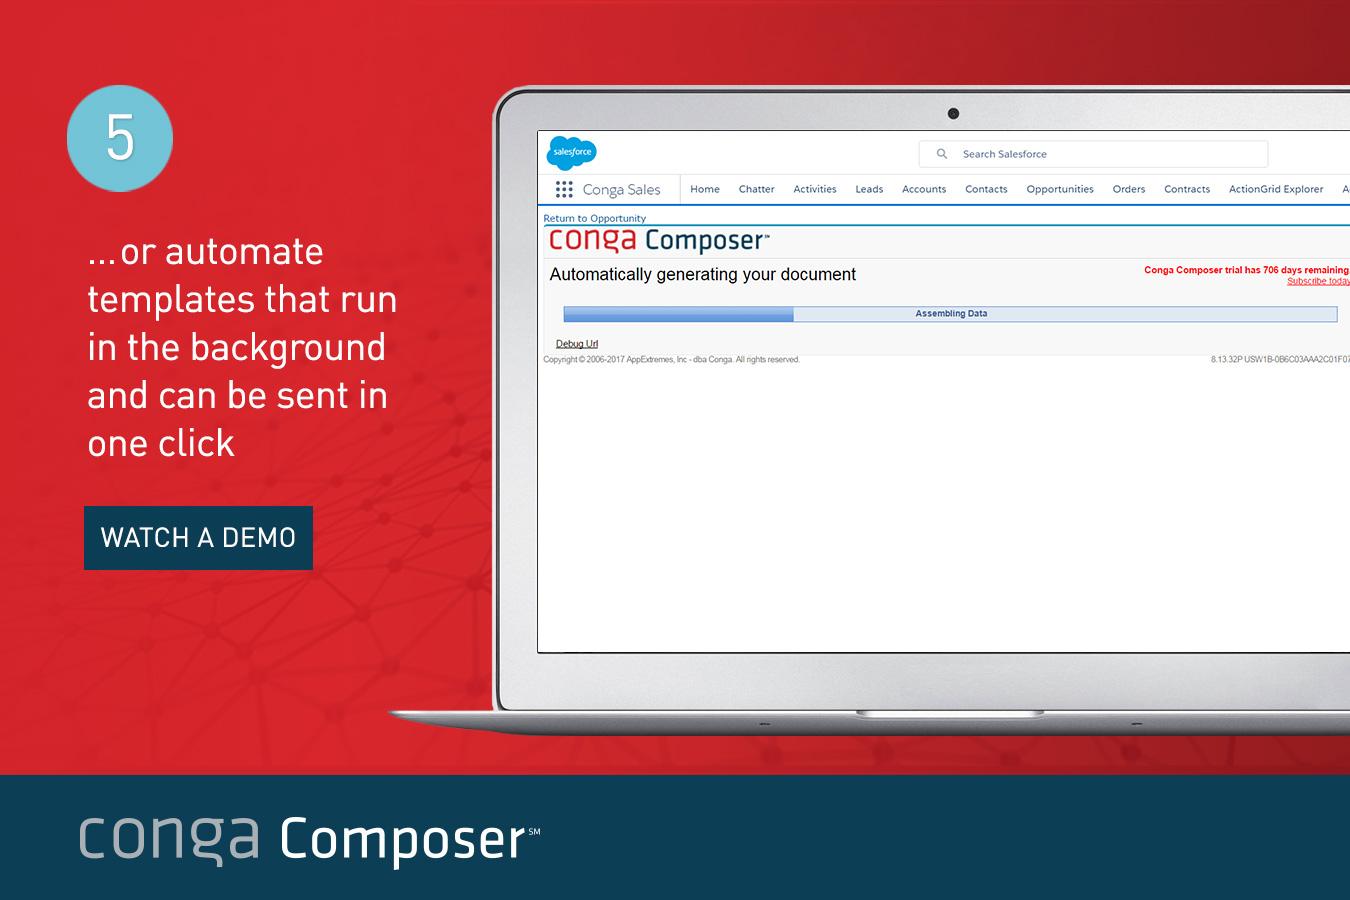 Conga Composer Demo - Template Automation